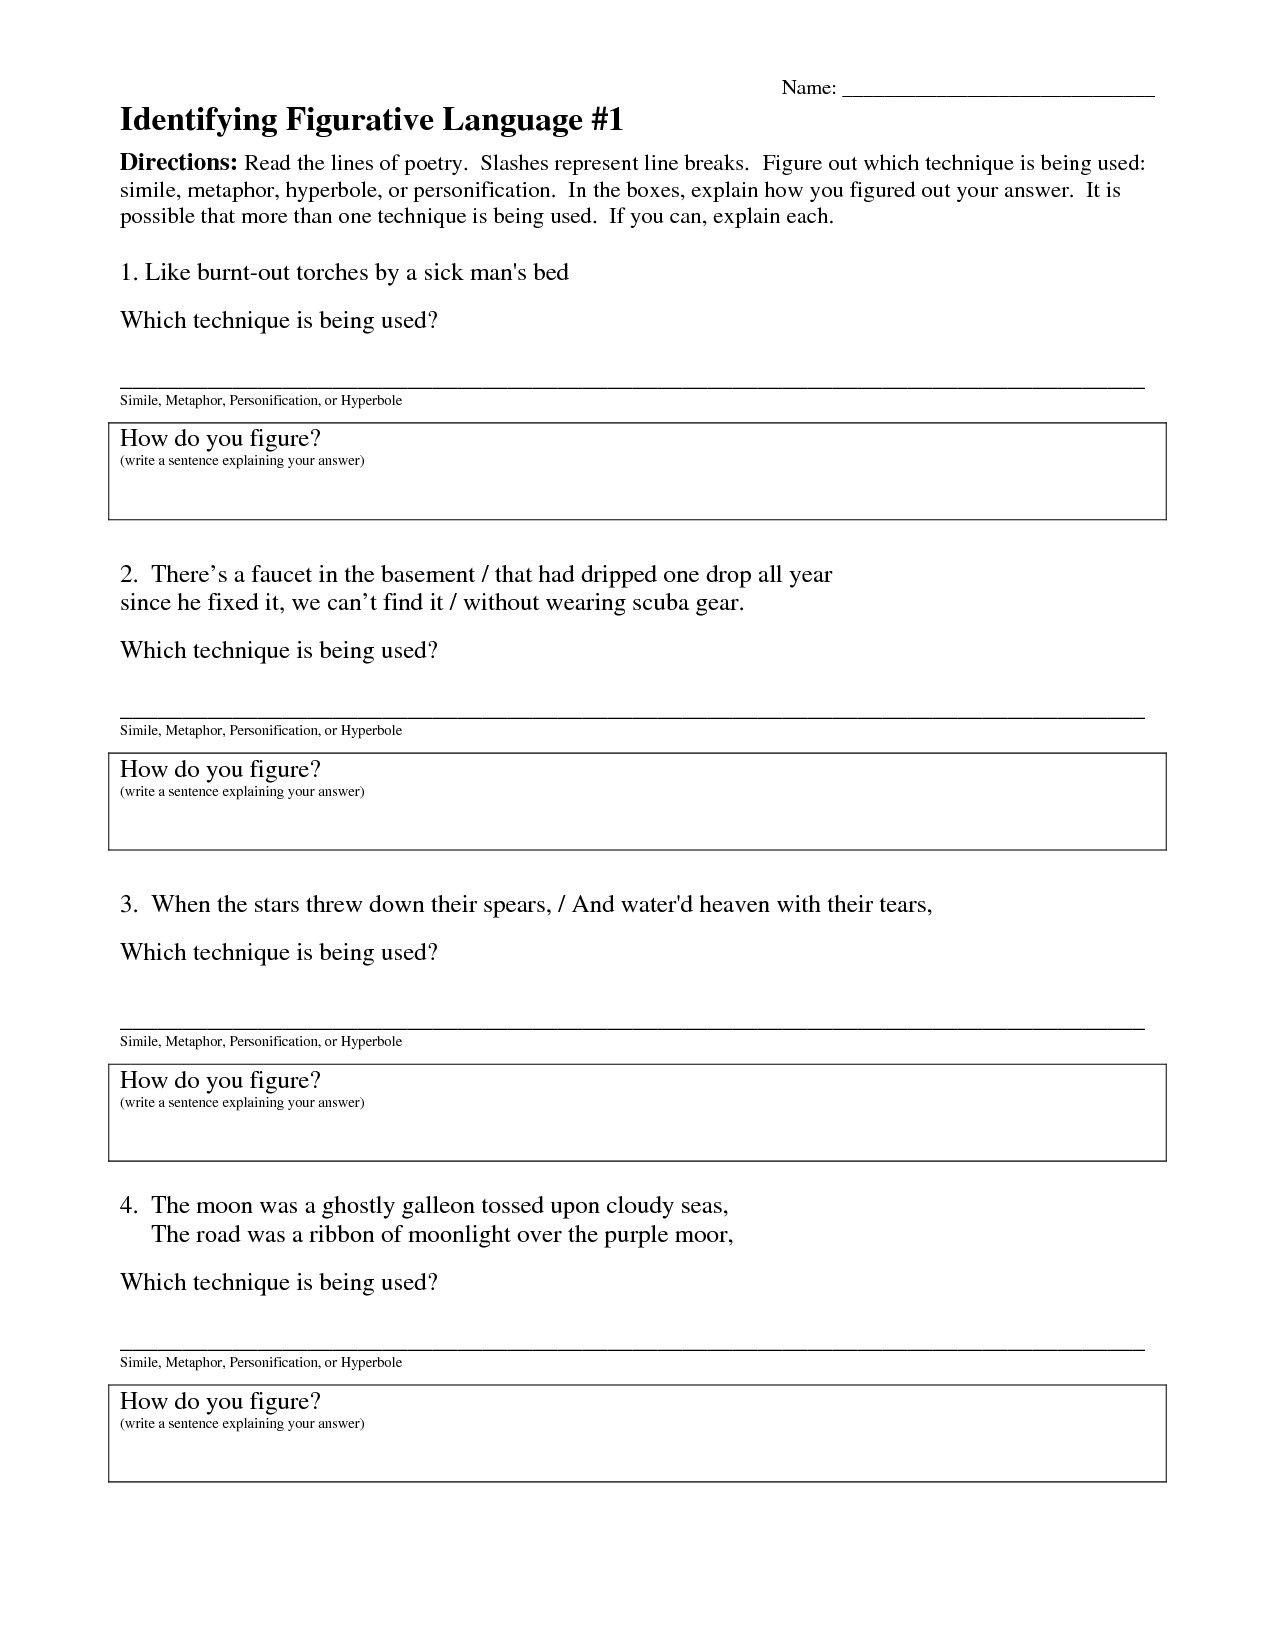 Figurative Language Worksheet Middle School In